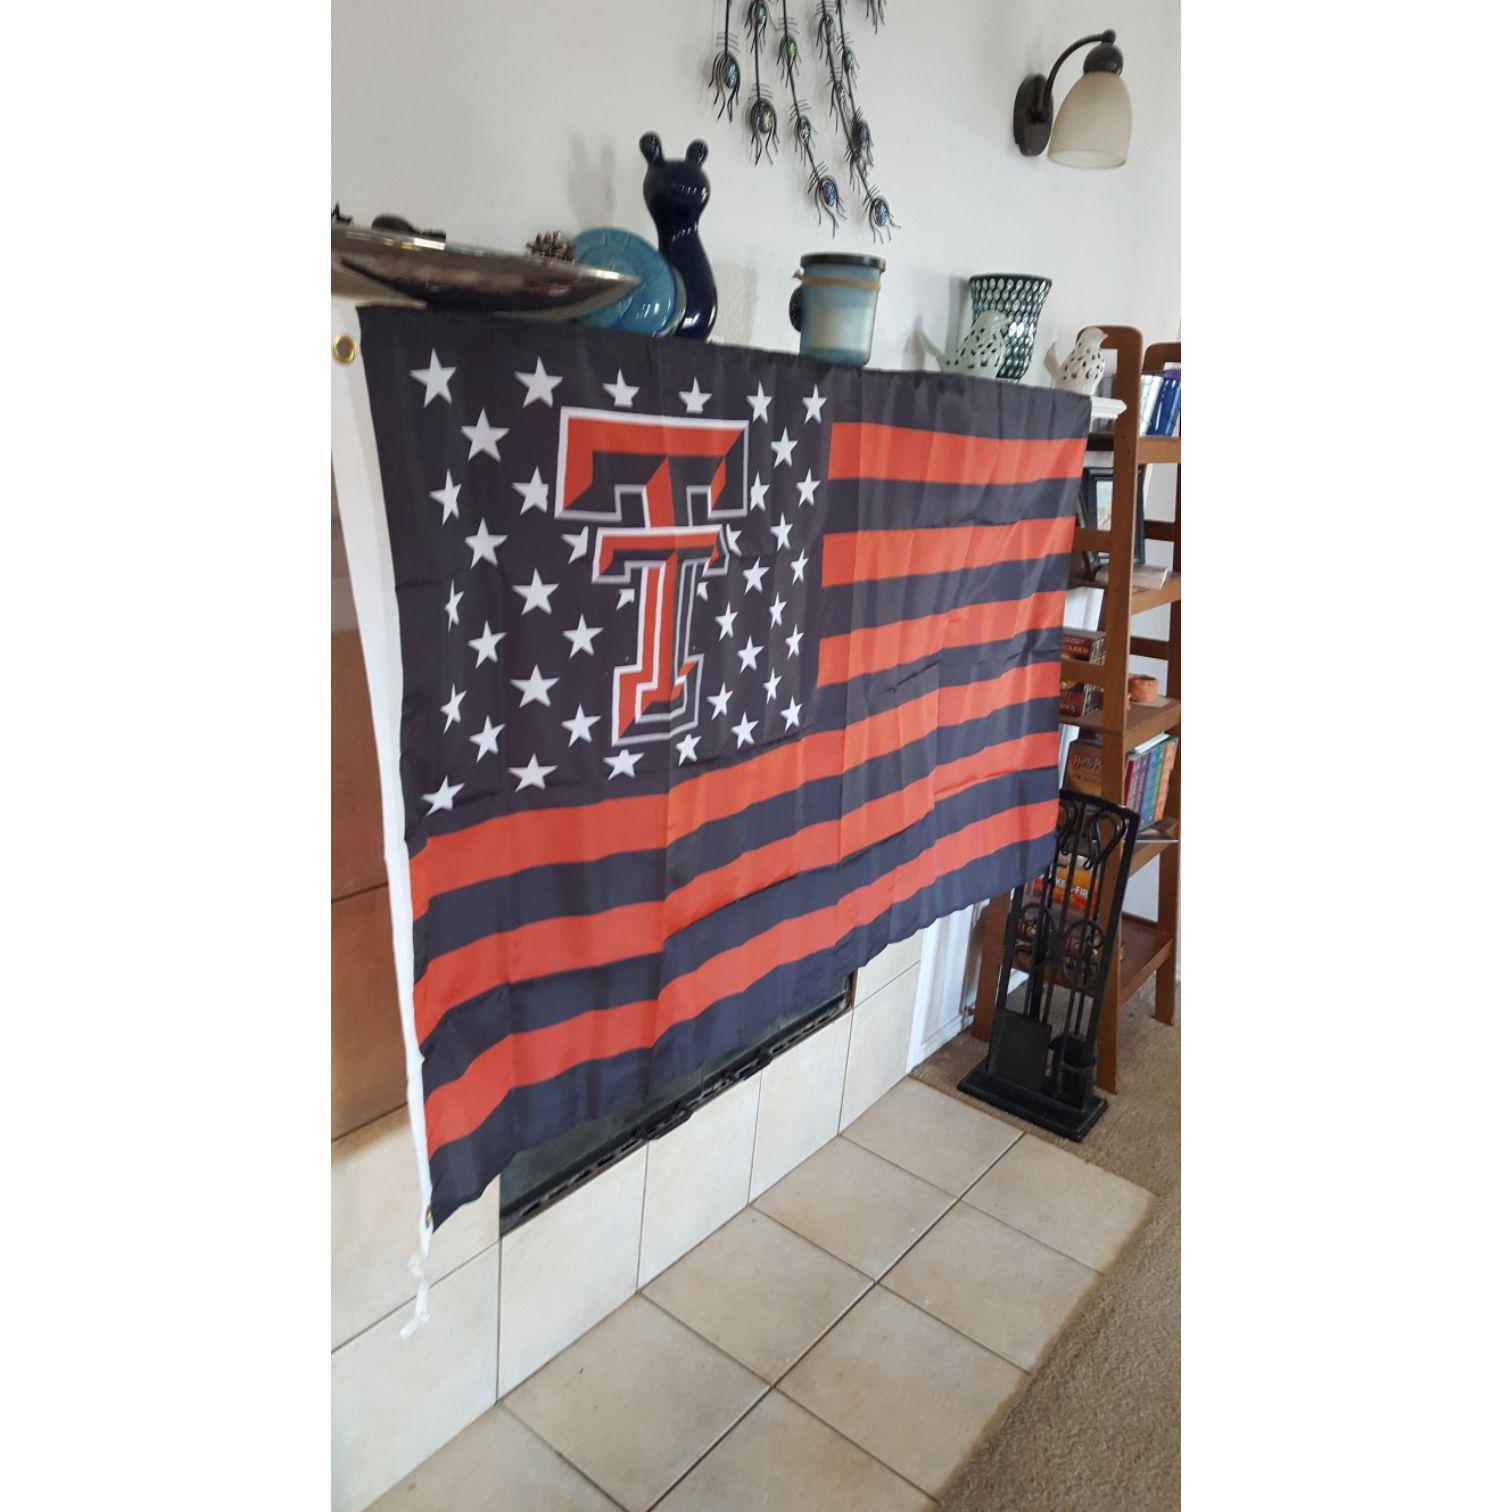 Texas Tech Red Raiders USA Style Flag Banner 3x5 Feet New in Bag